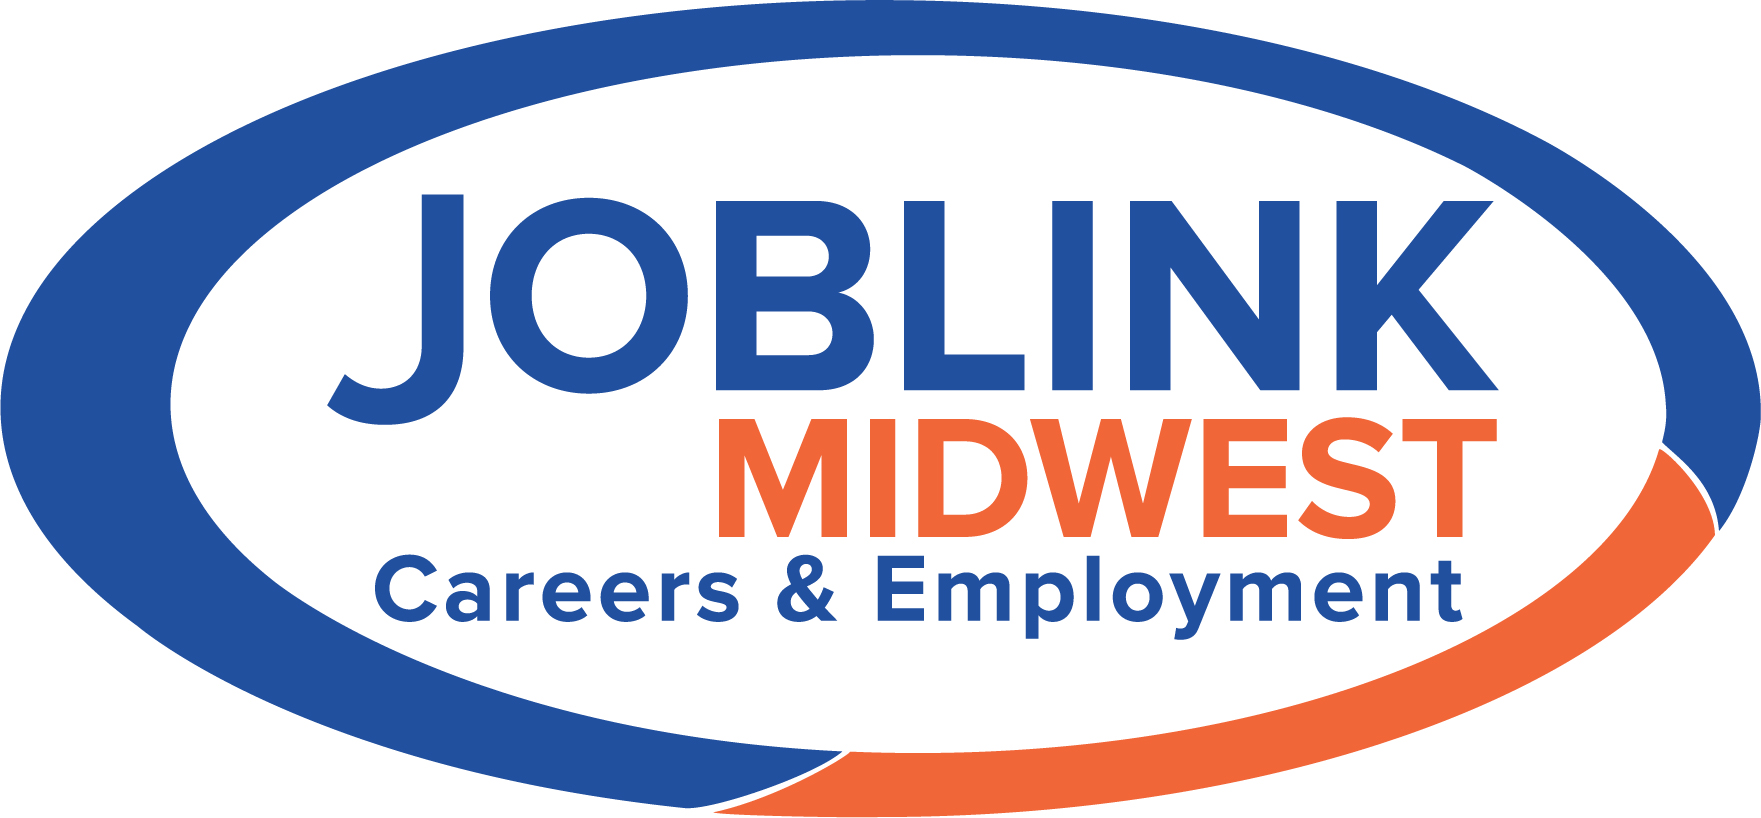 Joblink Midwest